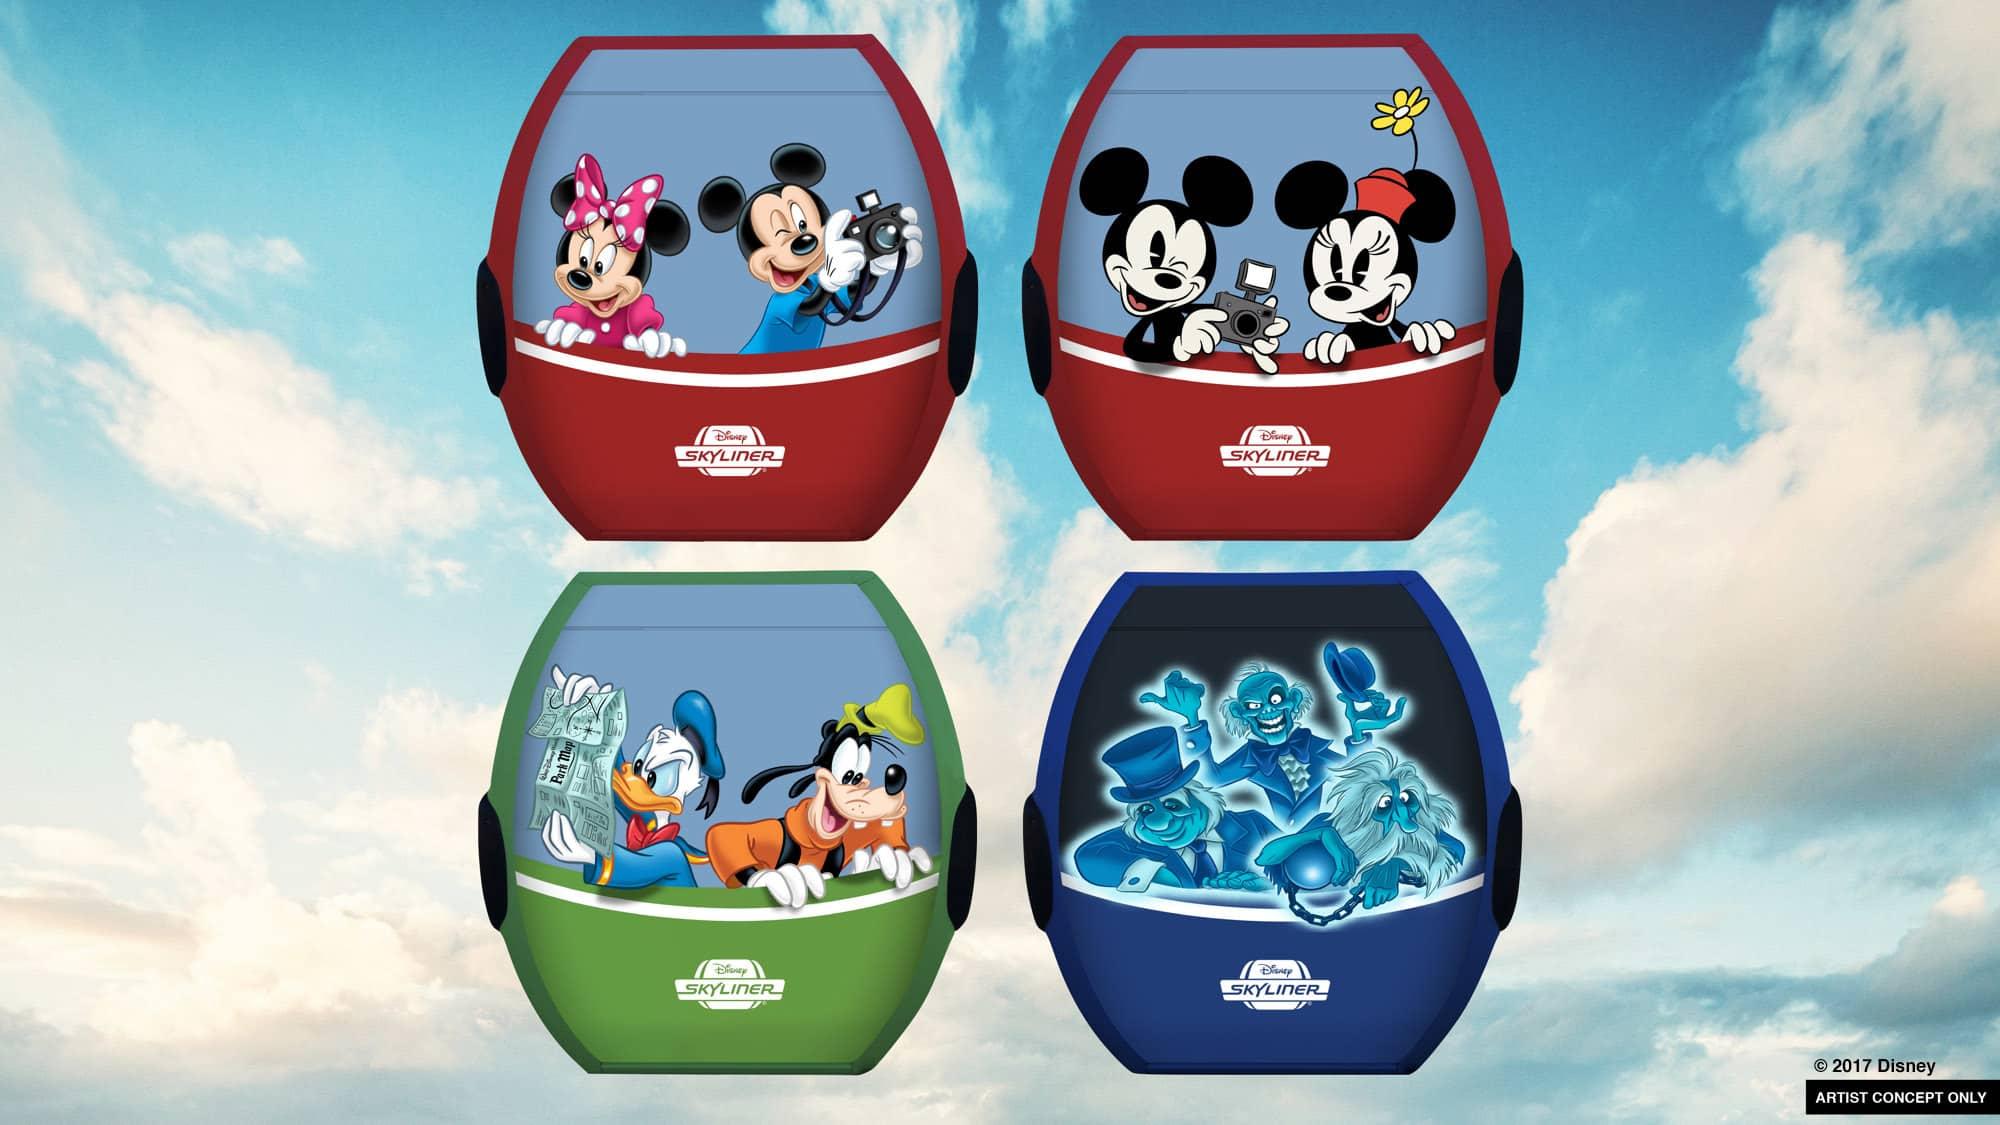 Disney World's gondolas officially announced